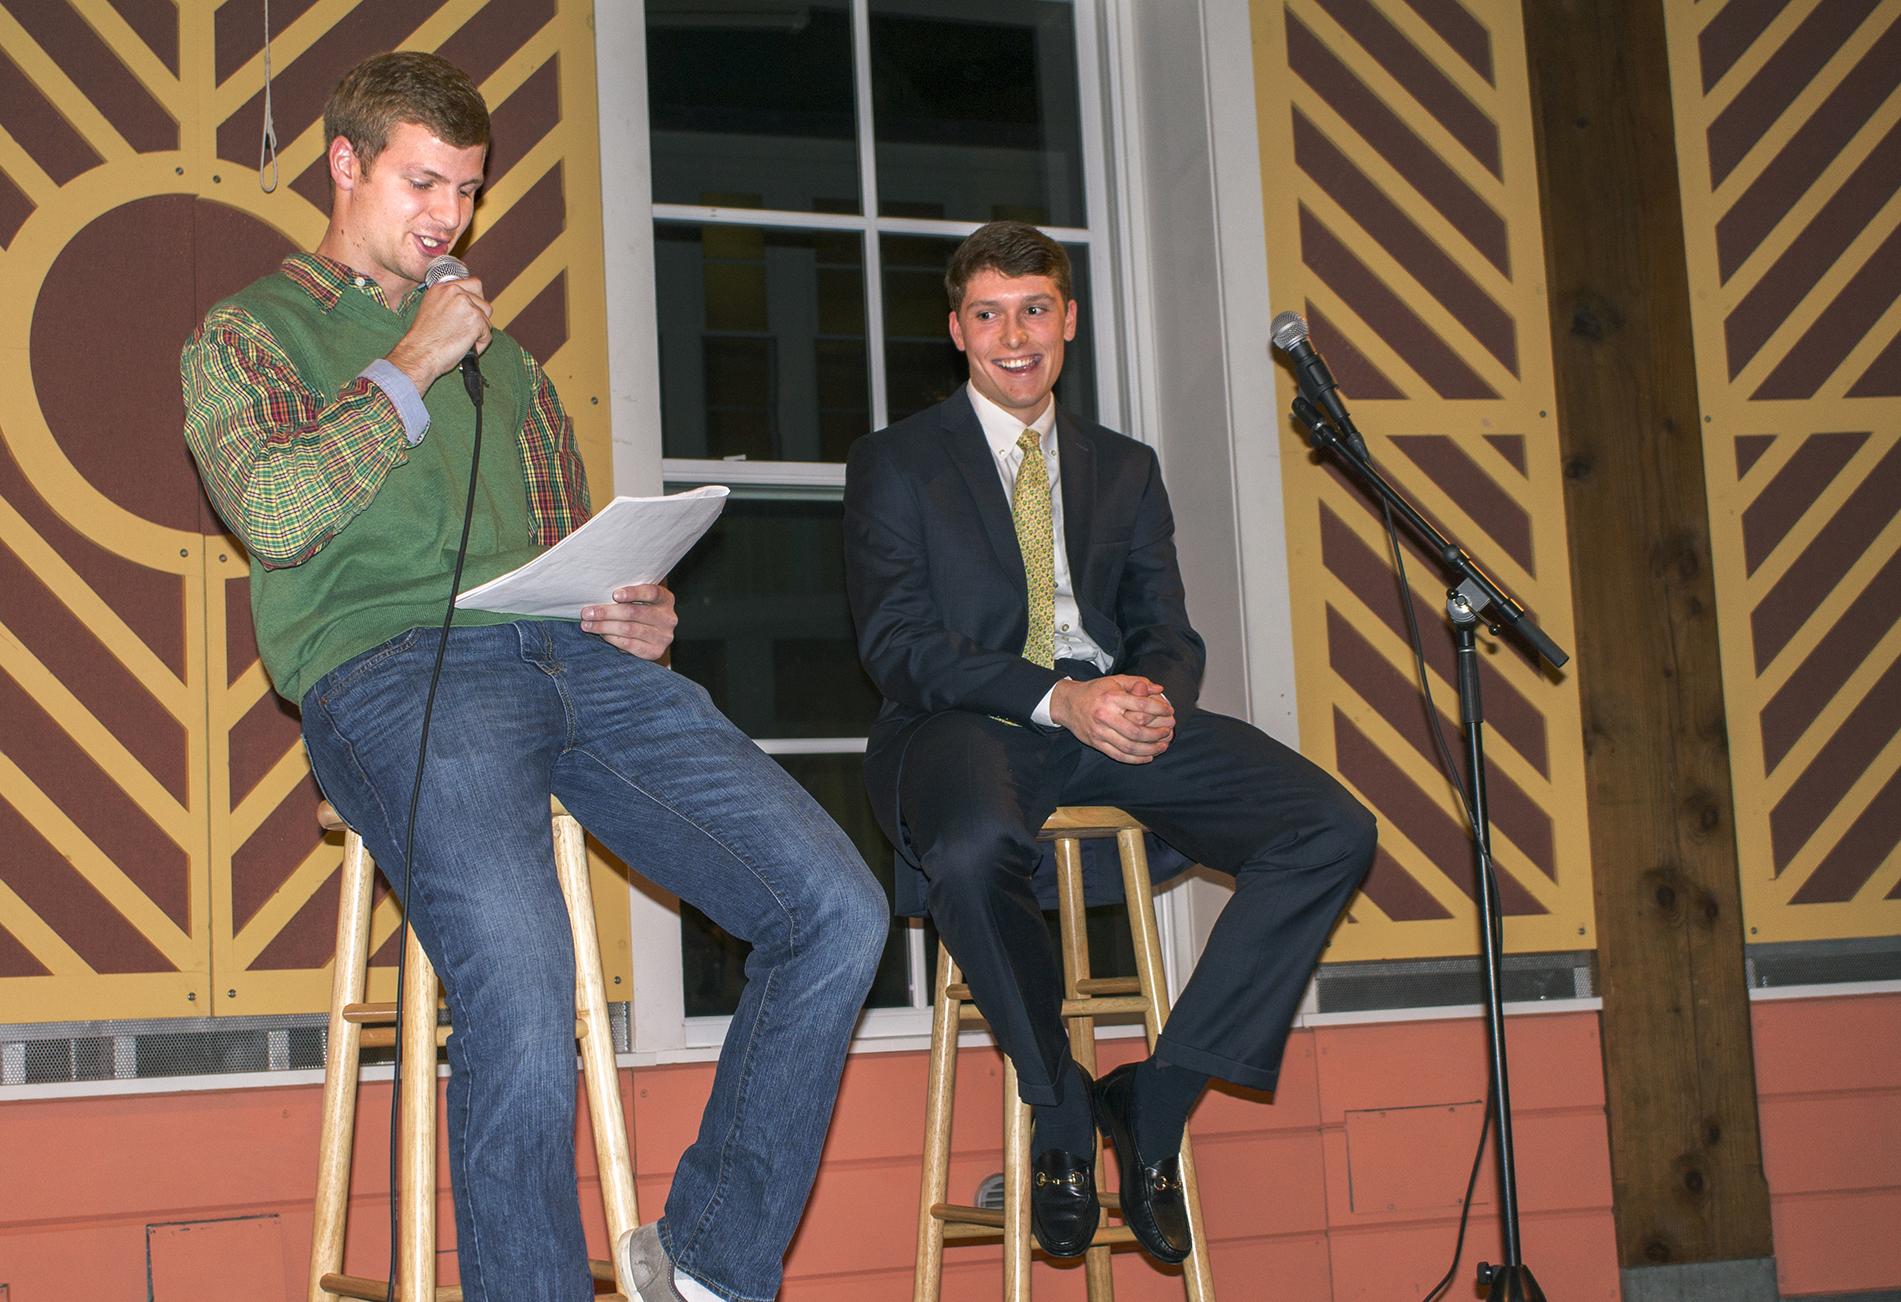 Host Truman Landowski '17 questions Tim Nowacki '18 at the auction.